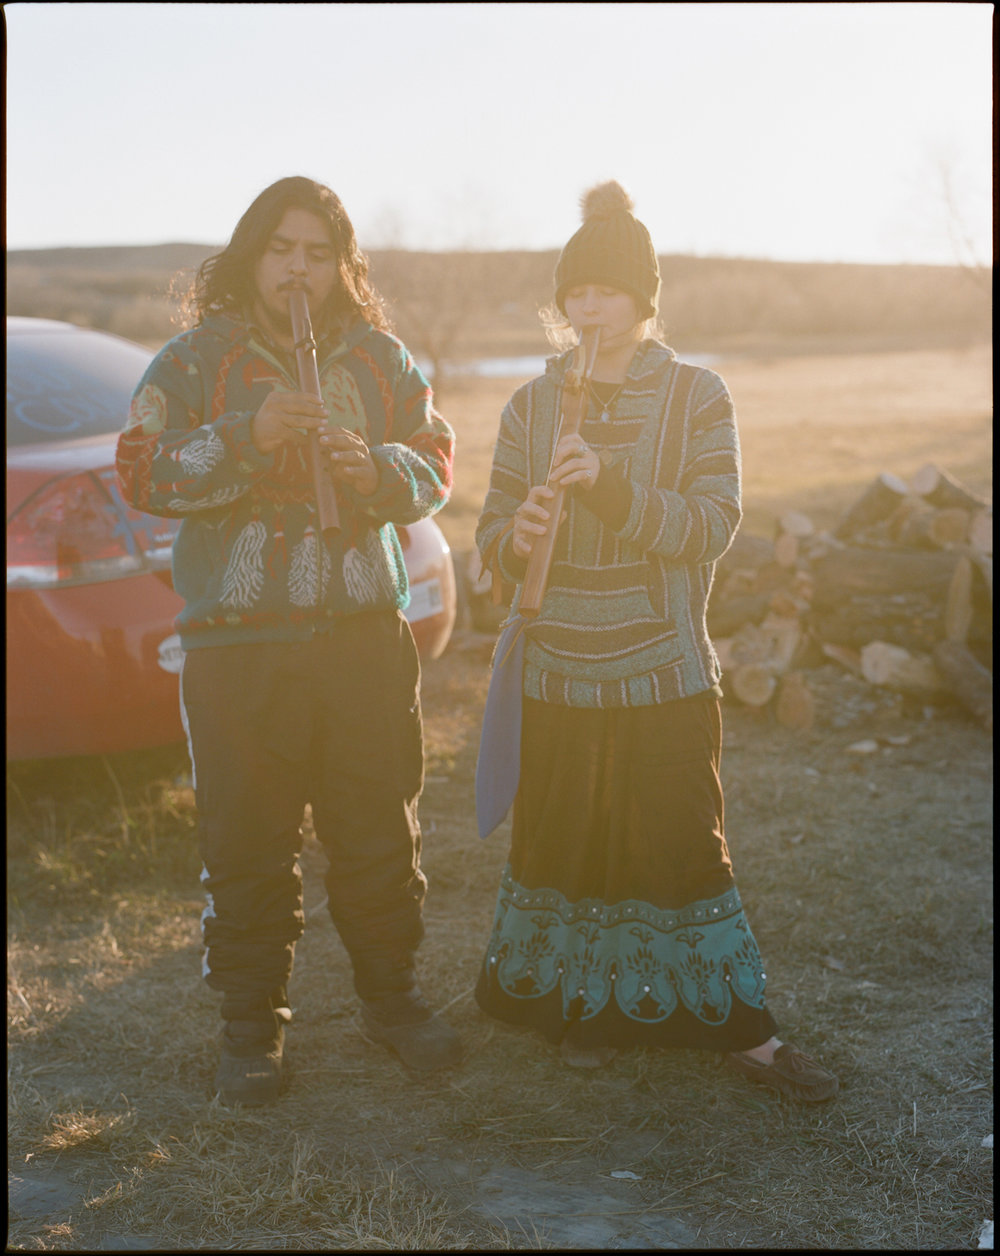 amber_mahoney_water_protectors_north_dakota_standing_rock_dapl_native_american_rights_012.jpg